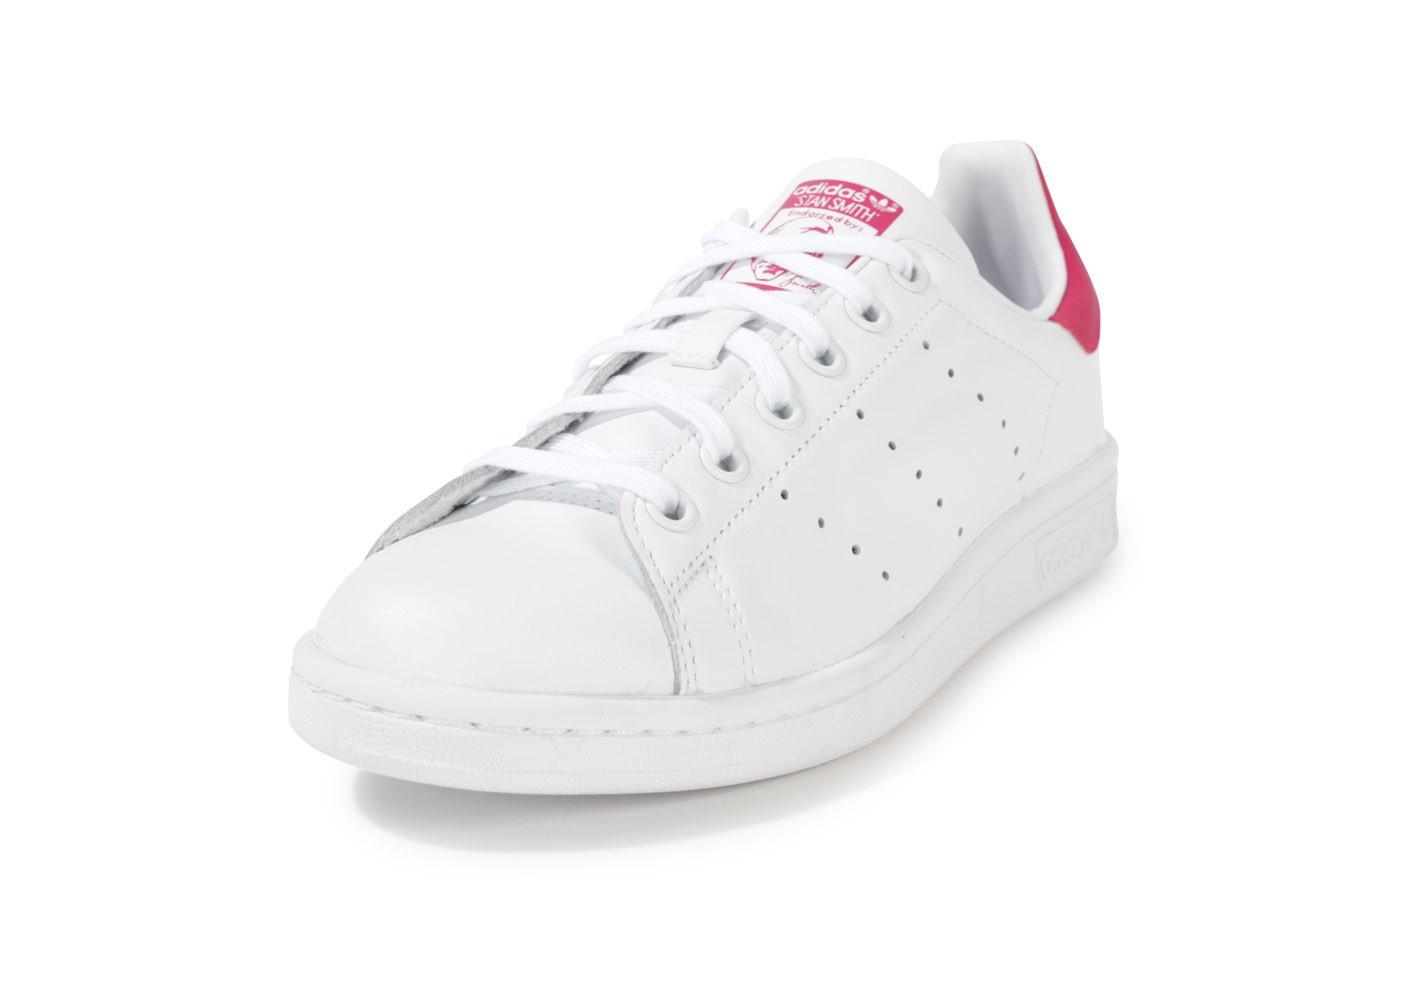 adidas stan smith scratch pas cher,femme chaussures pas cher